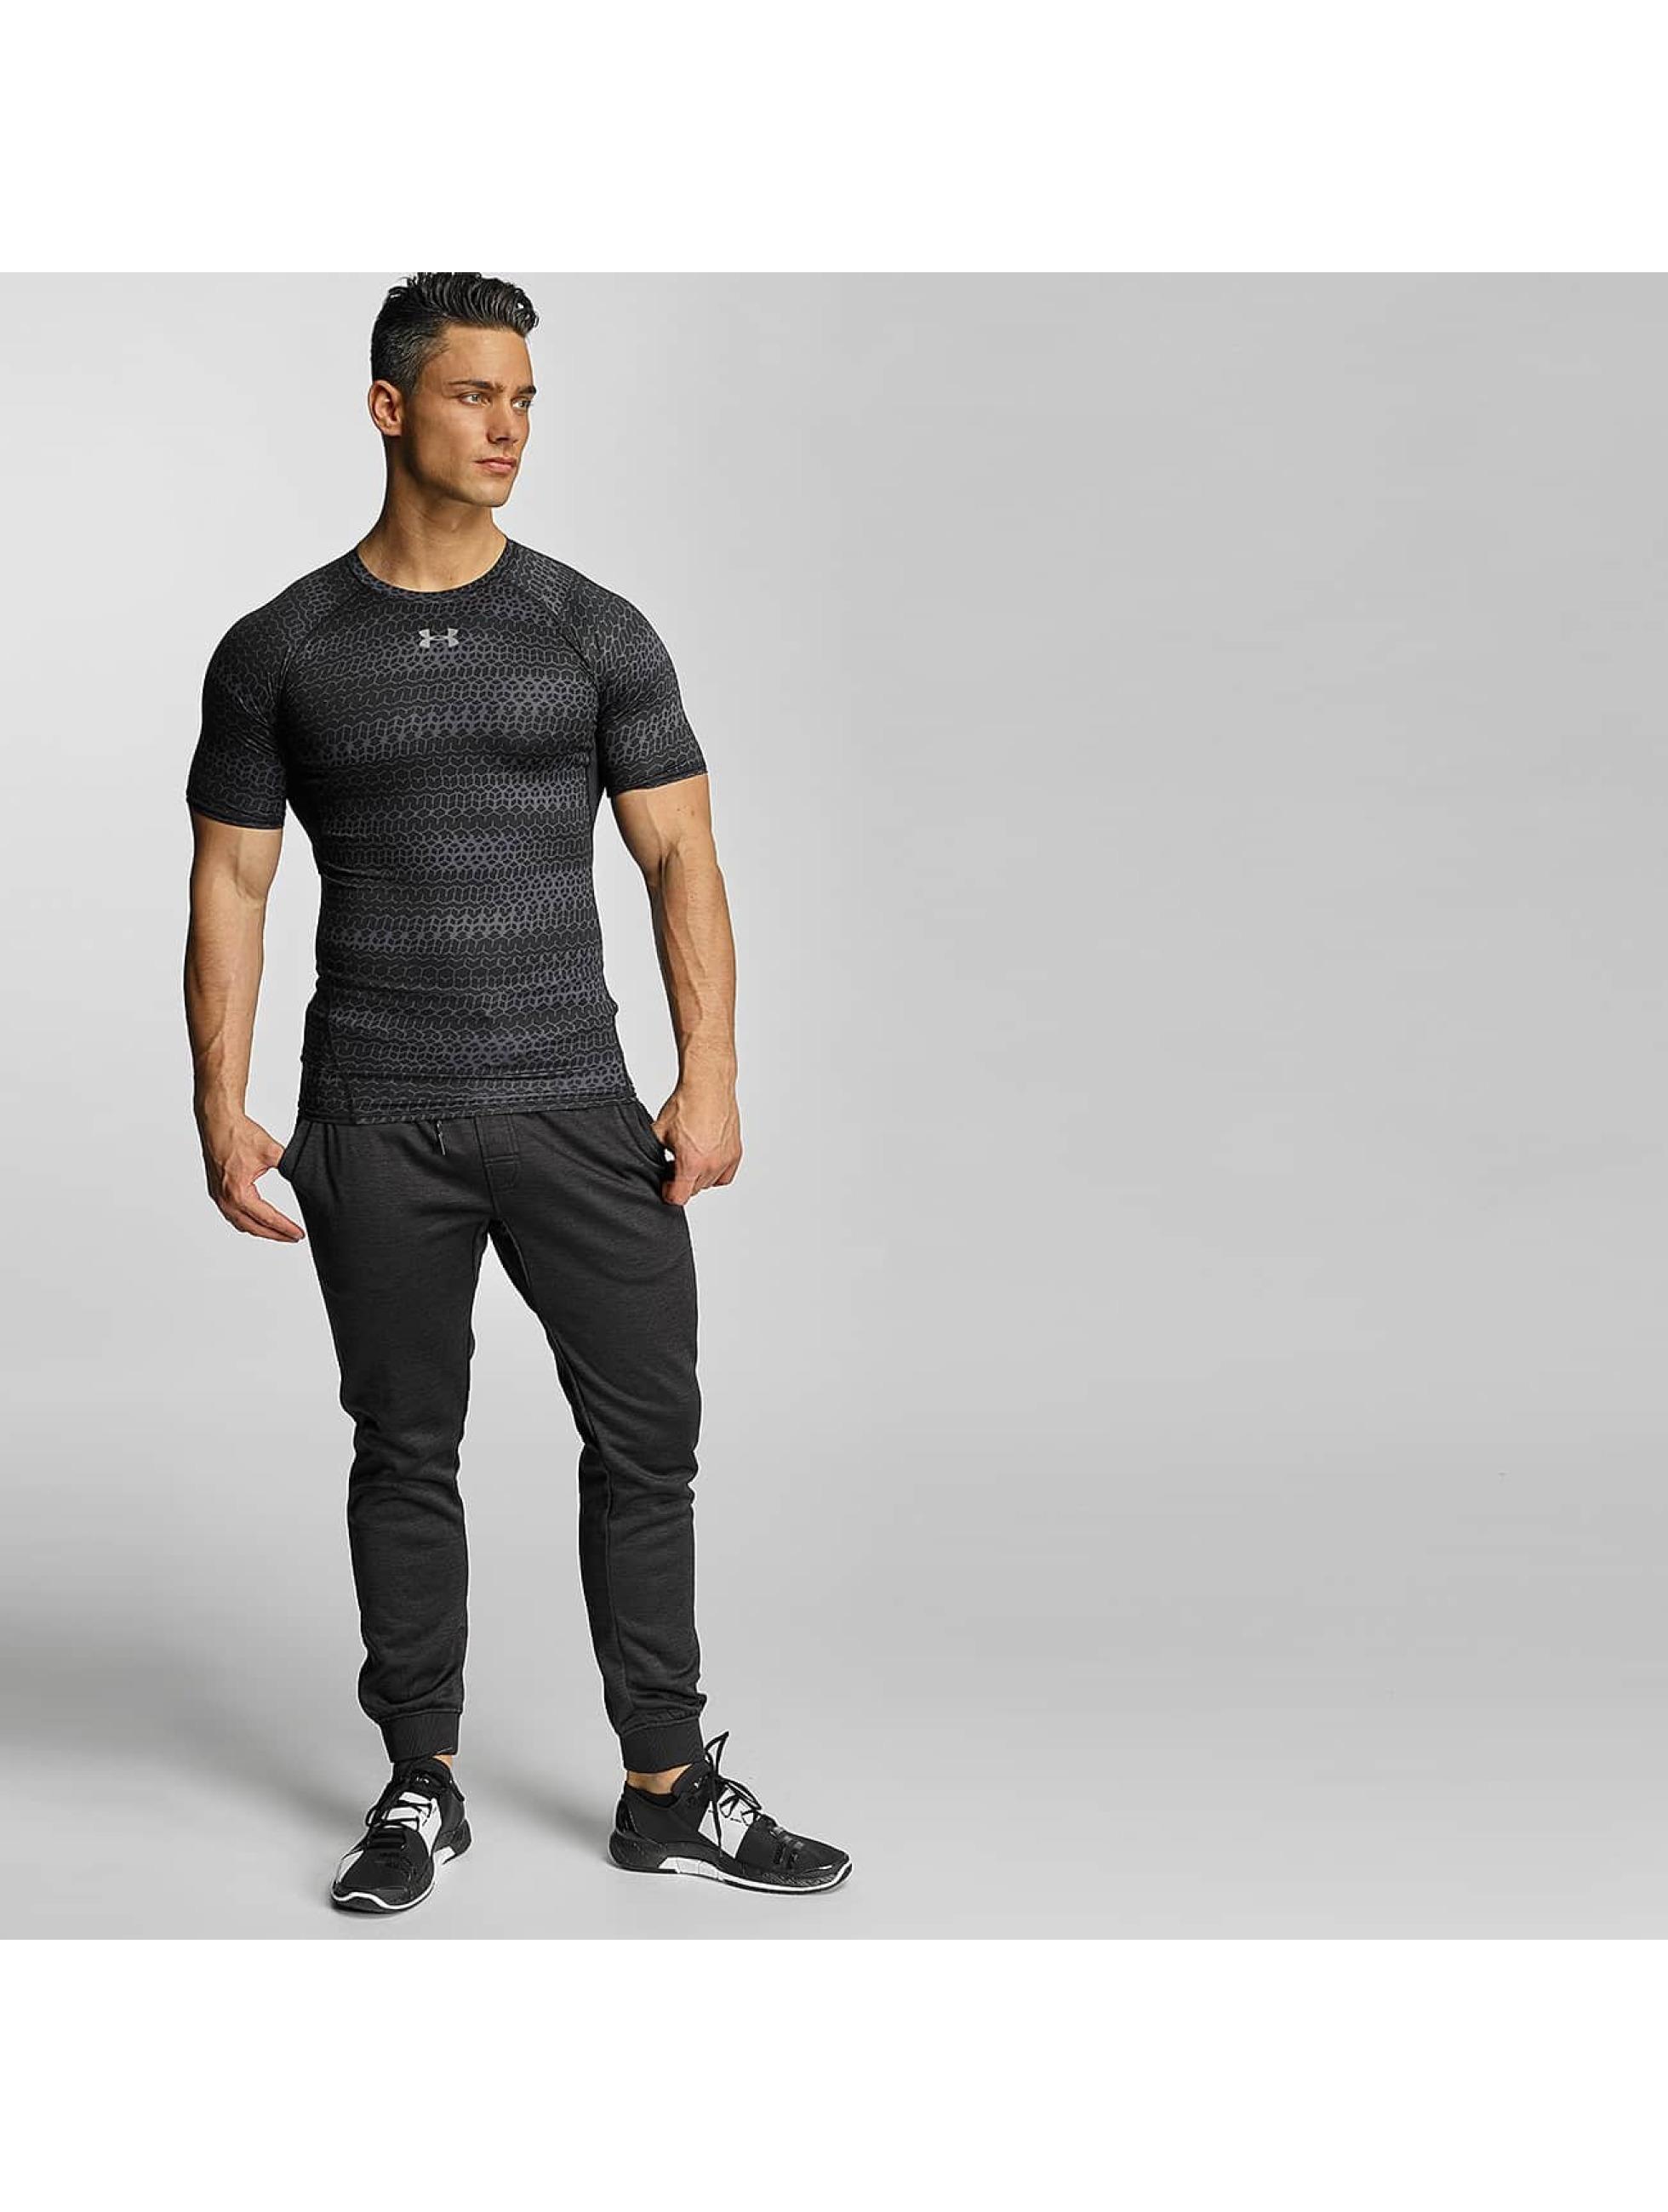 Under Armour T-Shirt Heatgear Printed Shortsleeve Compression black